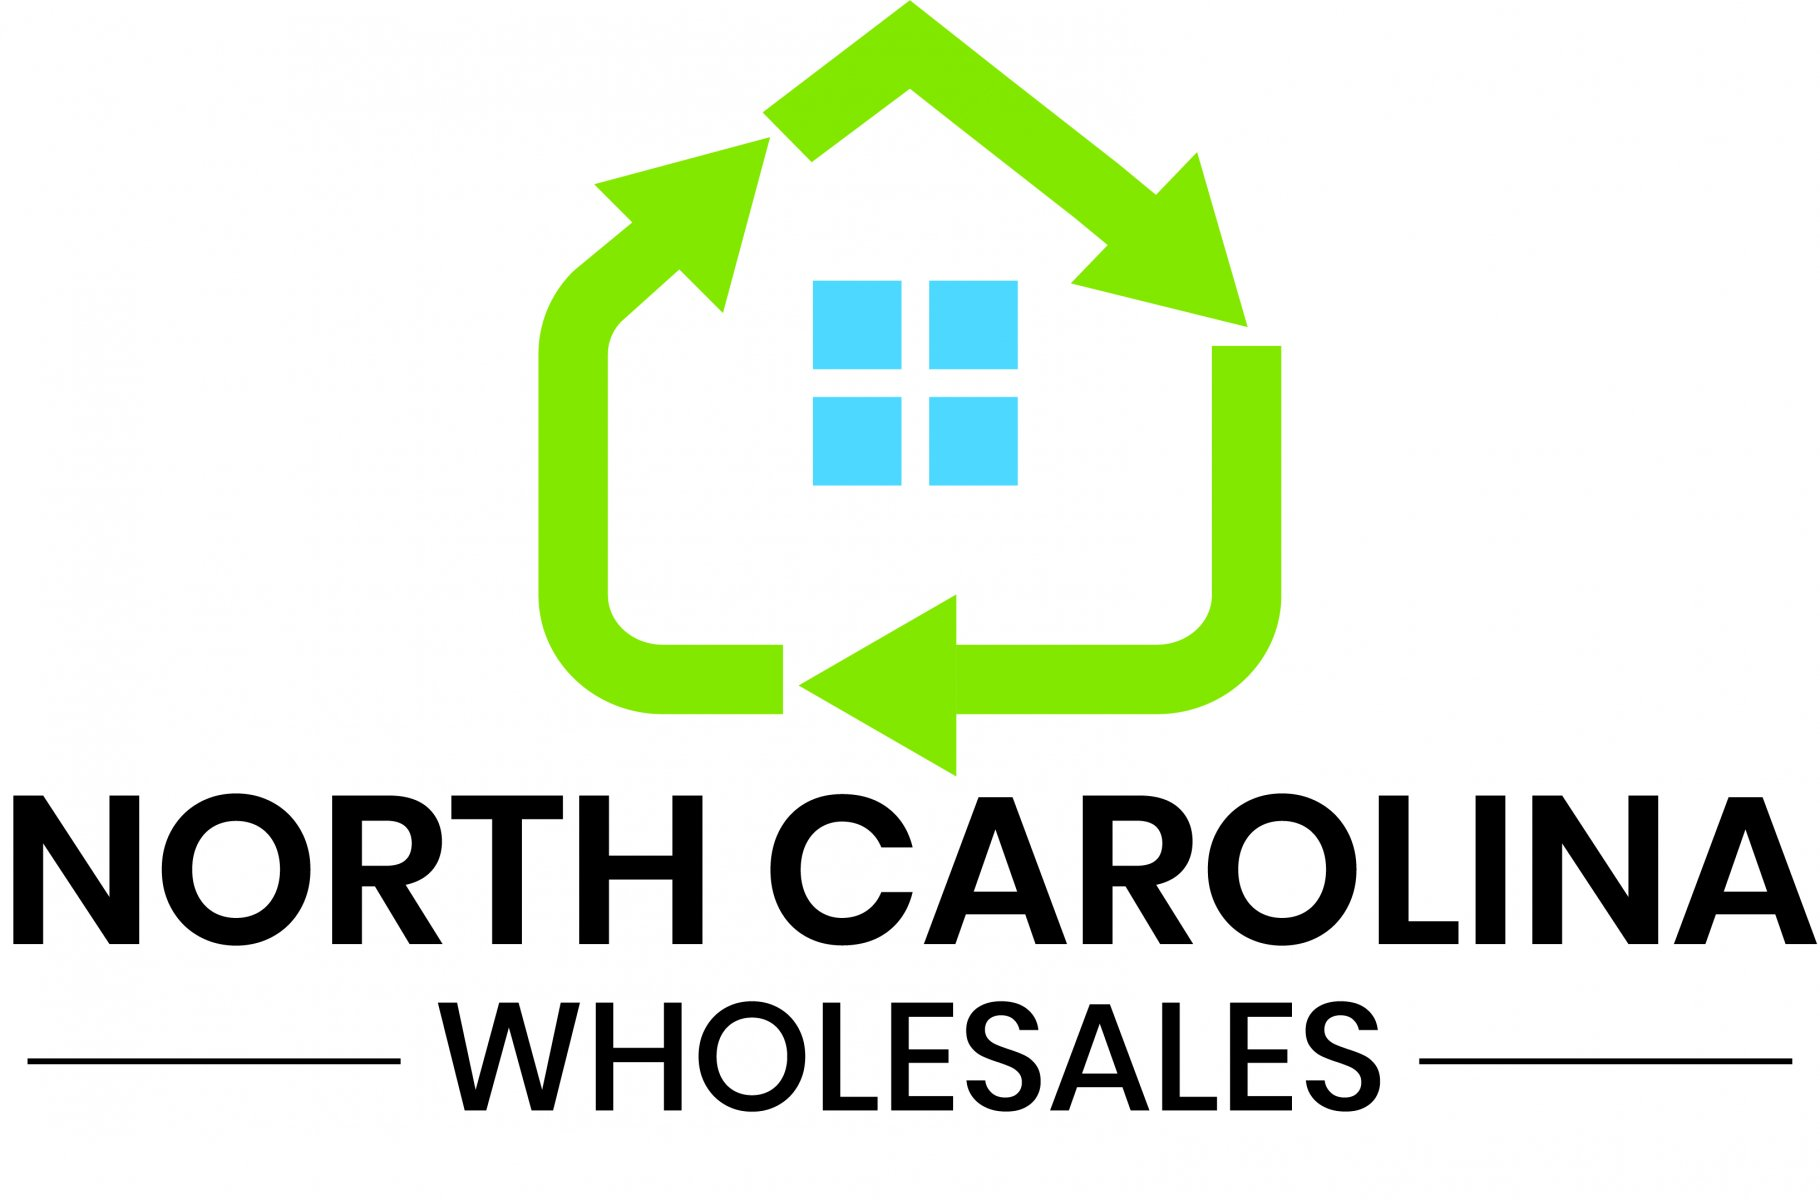 NC Wholesales logo